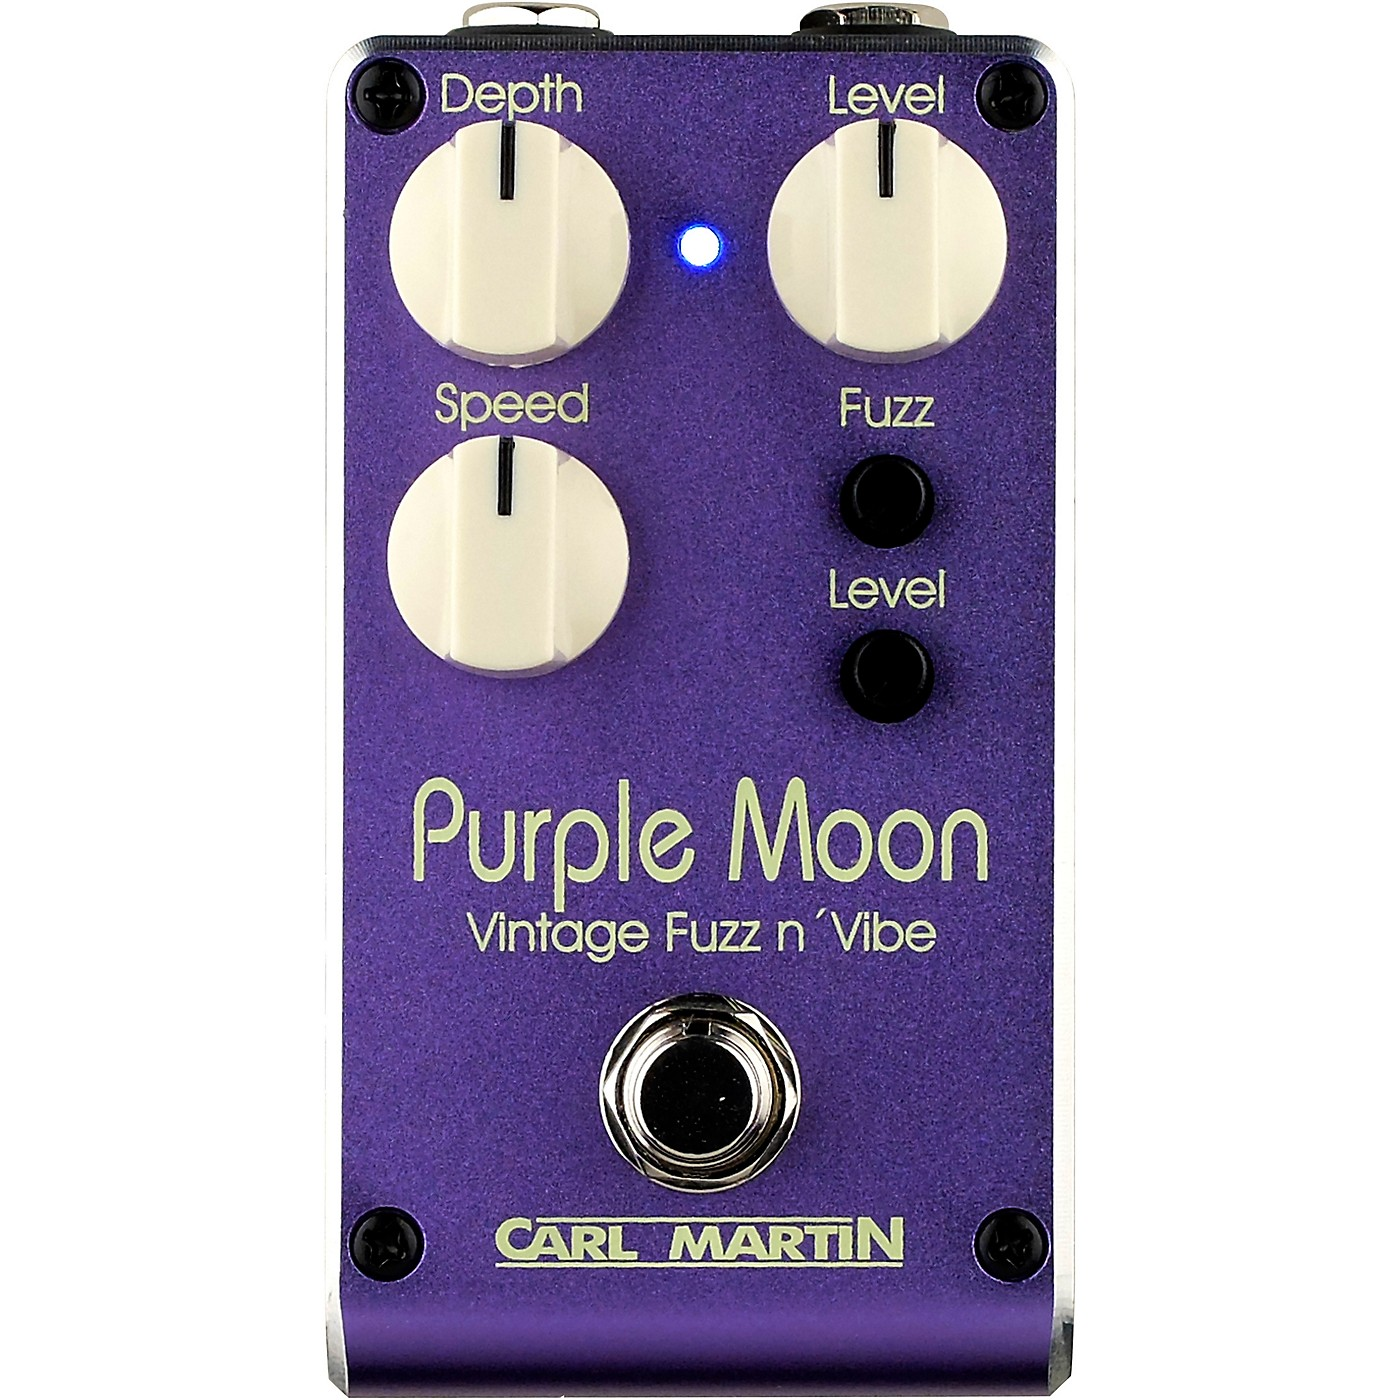 Carl Martin Purple Moon V2 Vintage Fuzz and Vibe Effects Pedal thumbnail